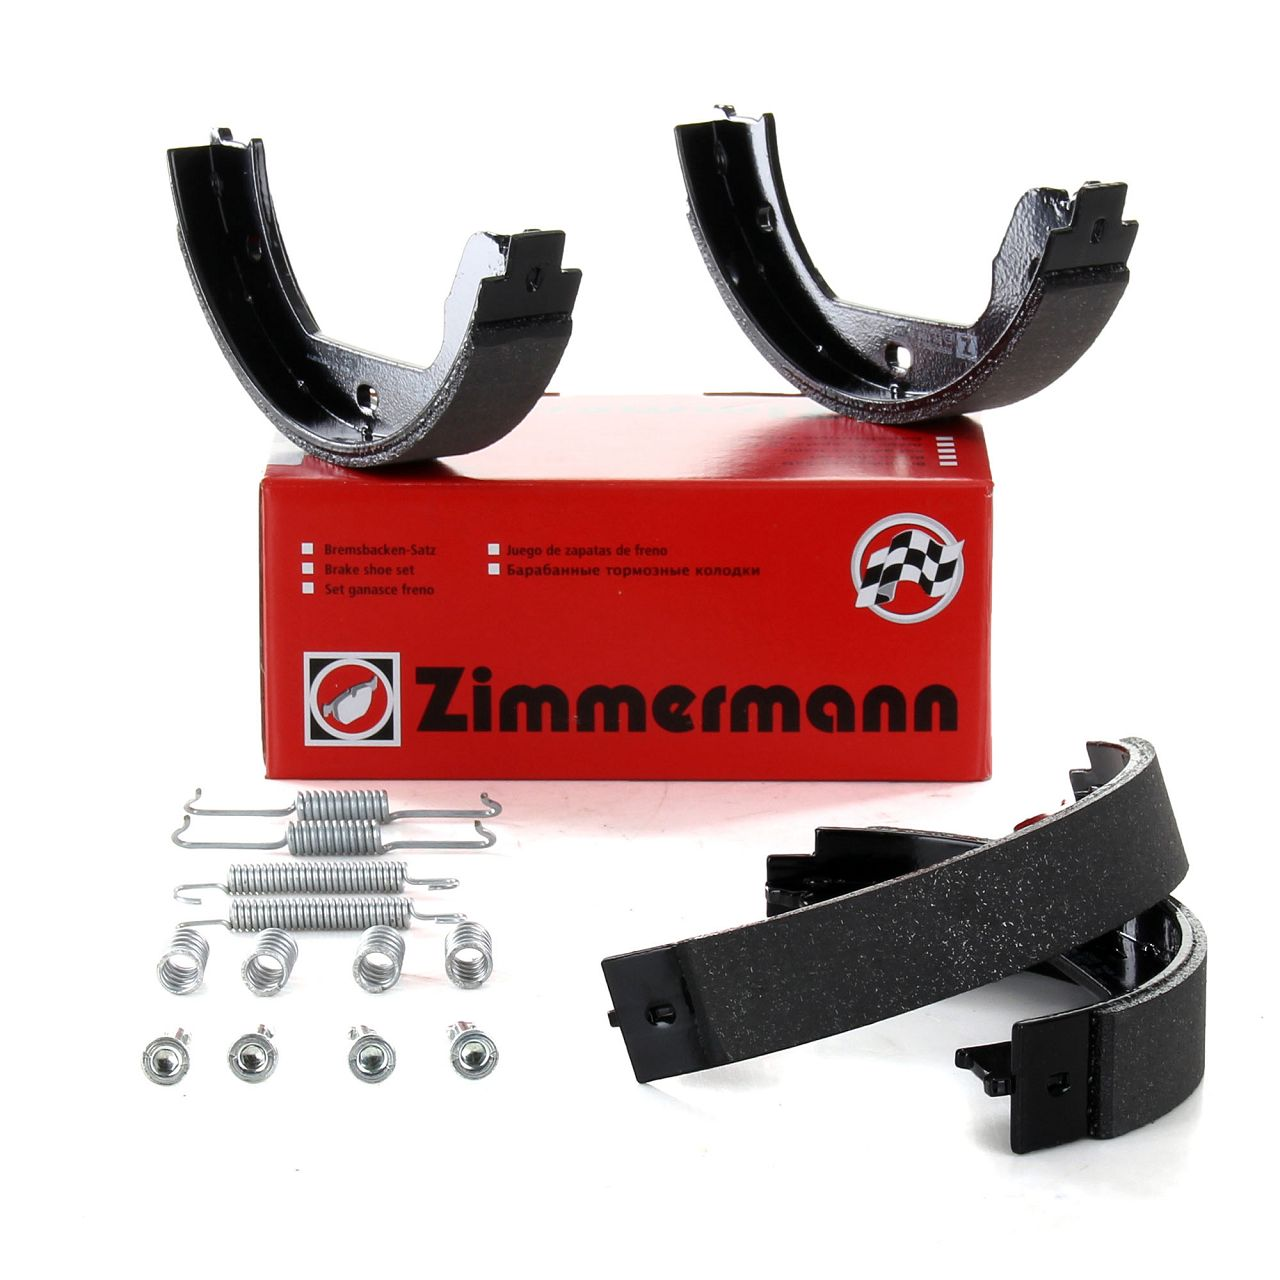 ZIMMERMANN Bremsbacken + Zubehör Satz BMW E46 E39 E60-67 X3 X5 X6 VW Touareg T5